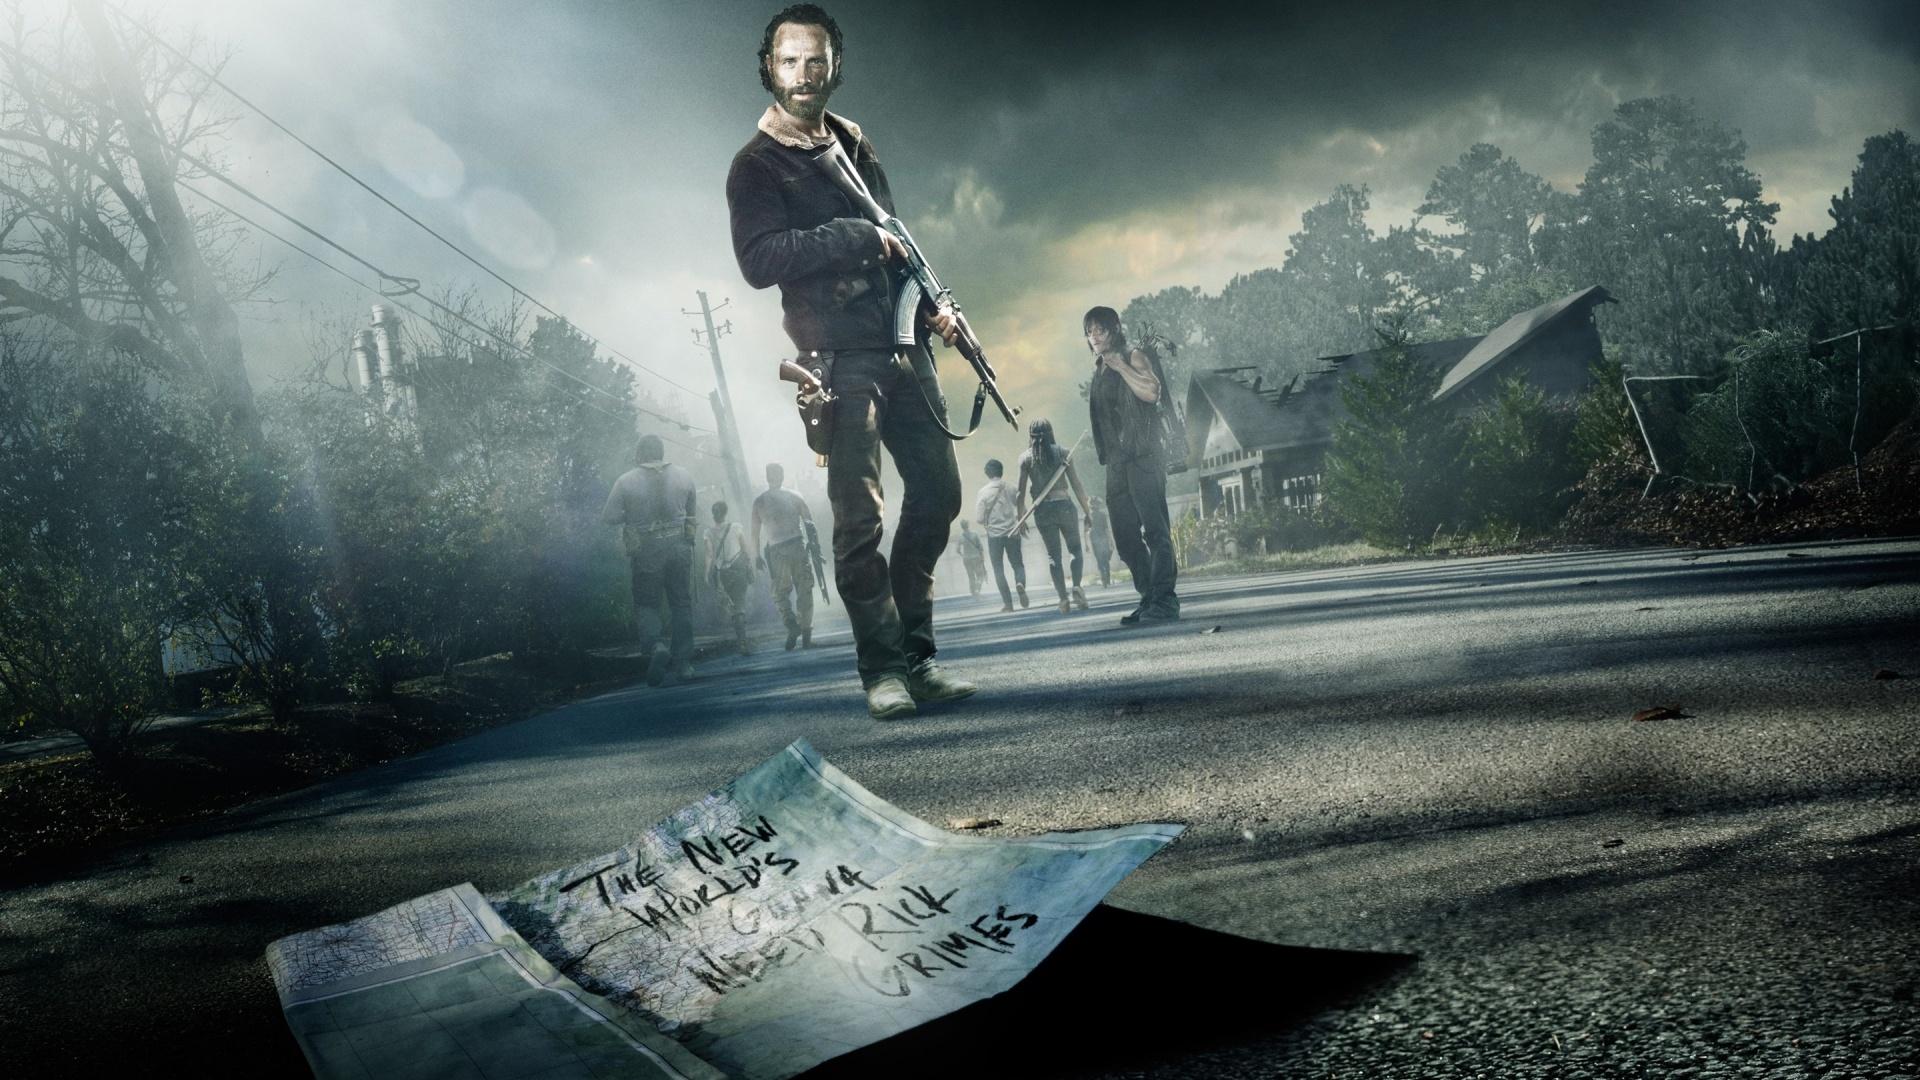 The Walking Dead free background